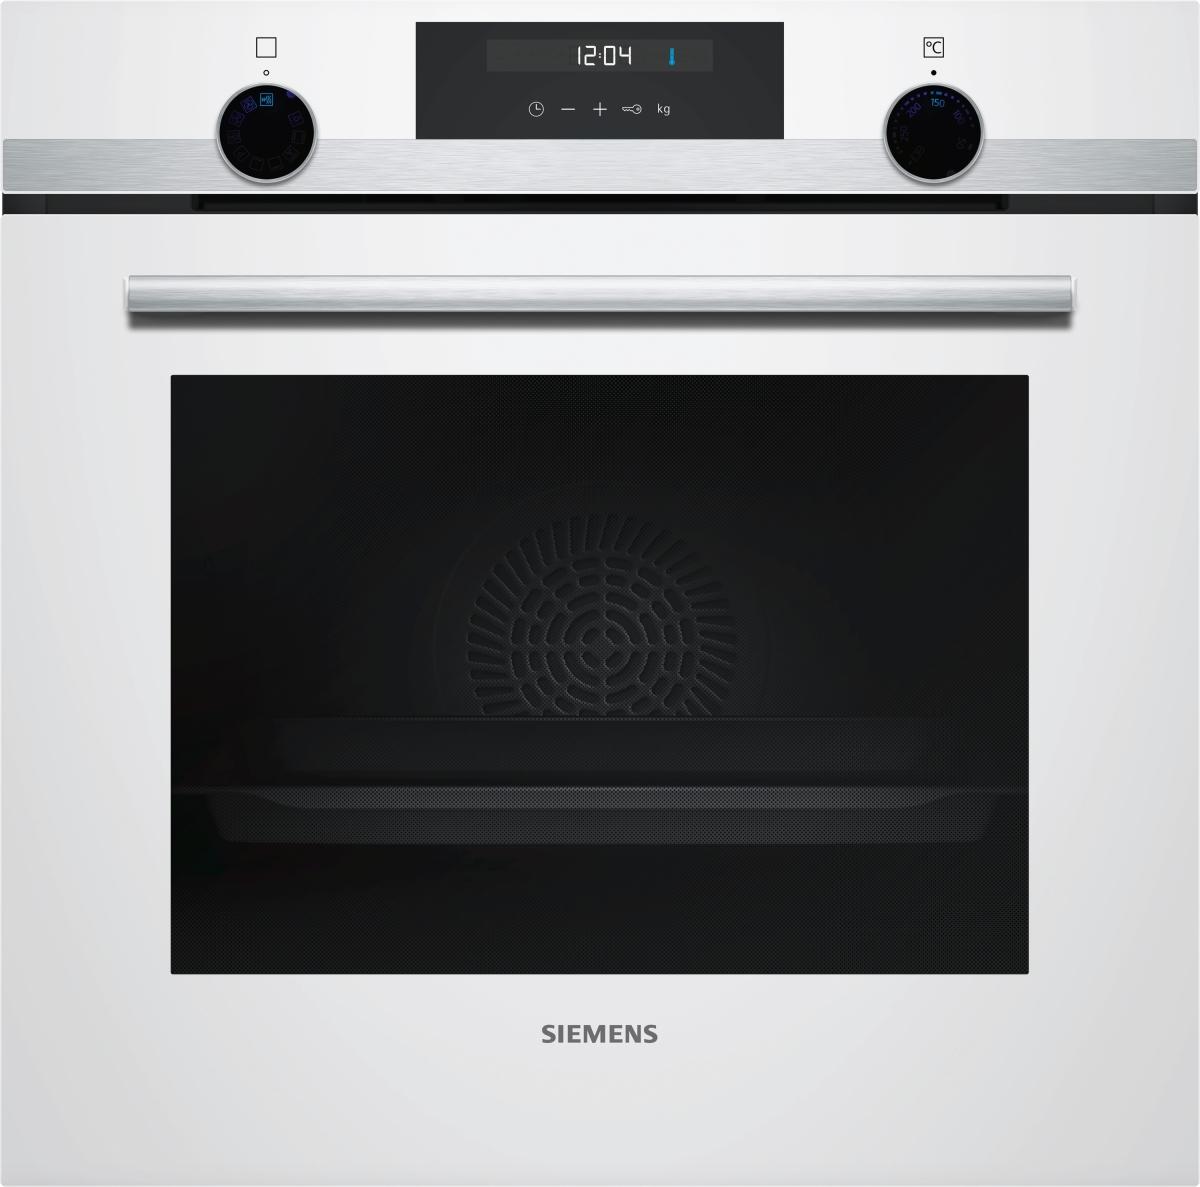 Siemens HB557GEW0W Backofen 60 cm Weiß lightControlLCD-DisplaycookControl10